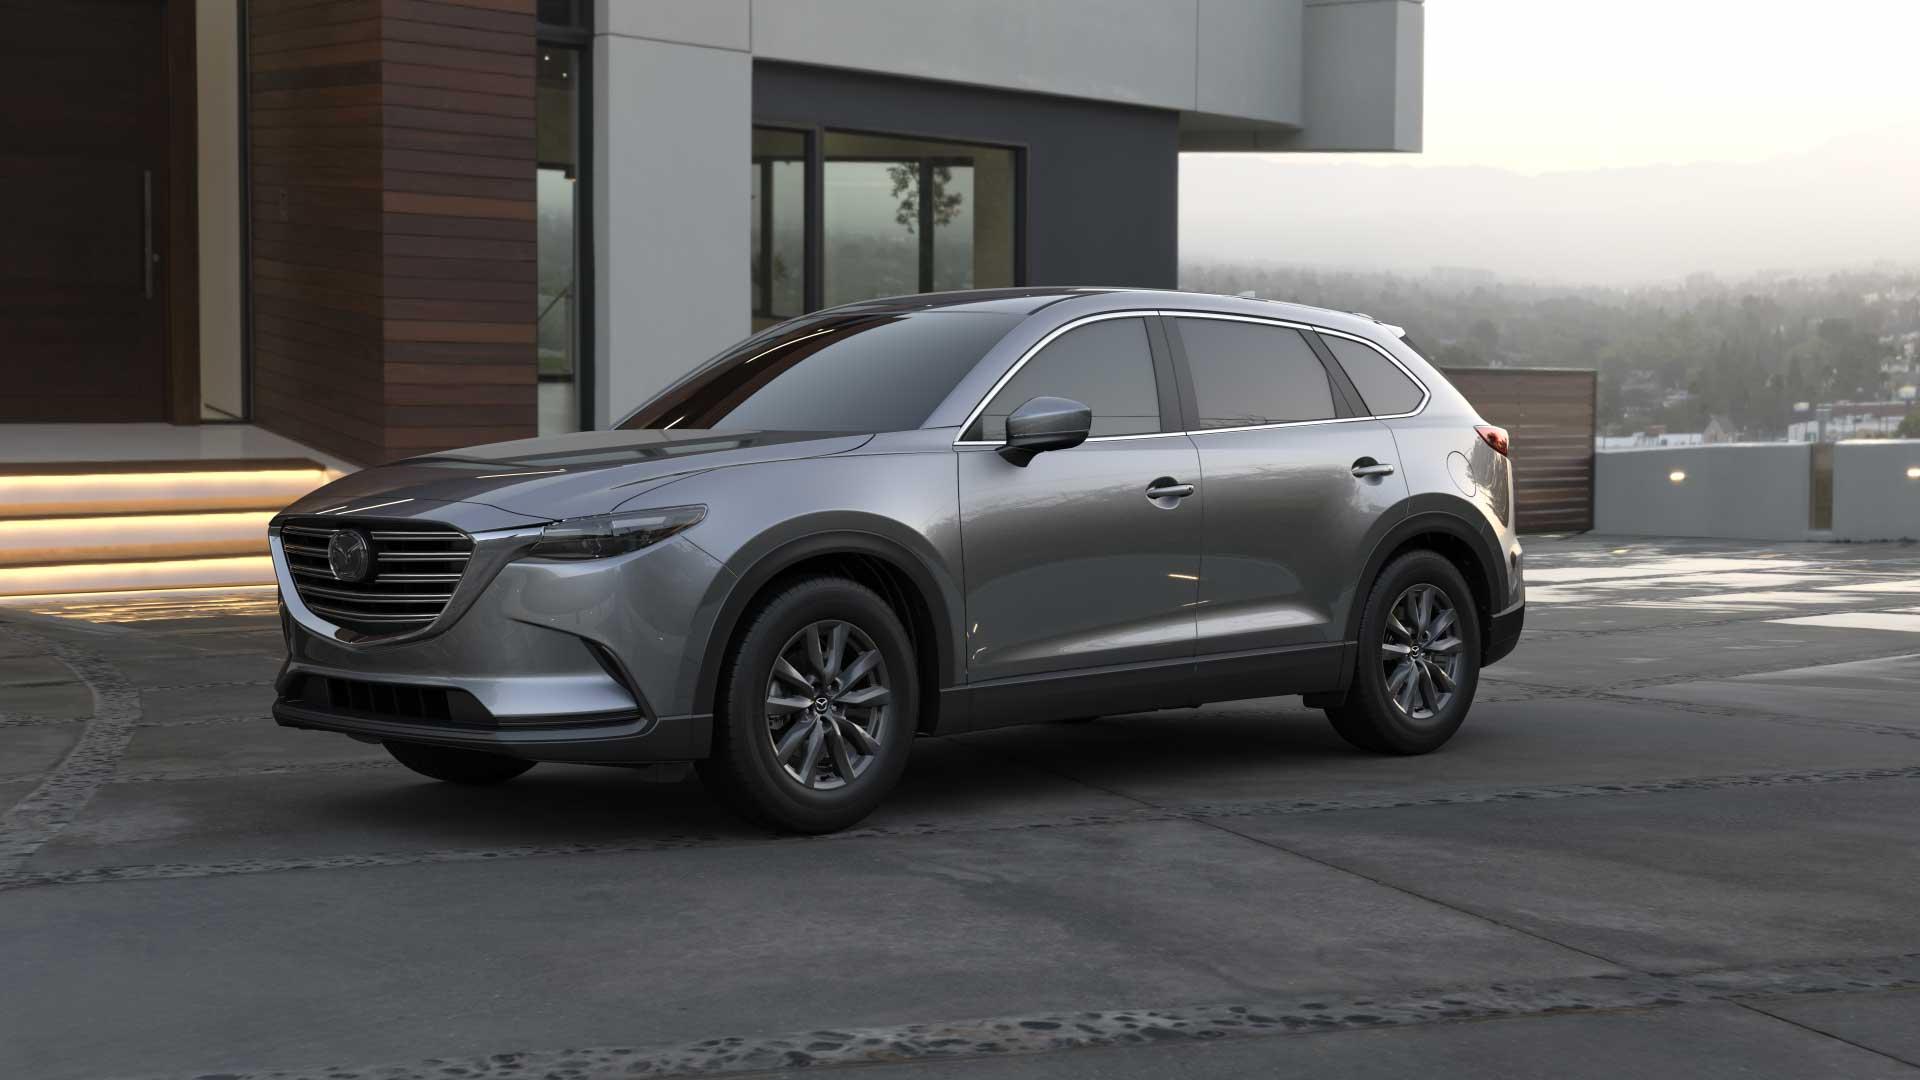 Kelebihan Kekurangan Mazda C Top Model Tahun Ini